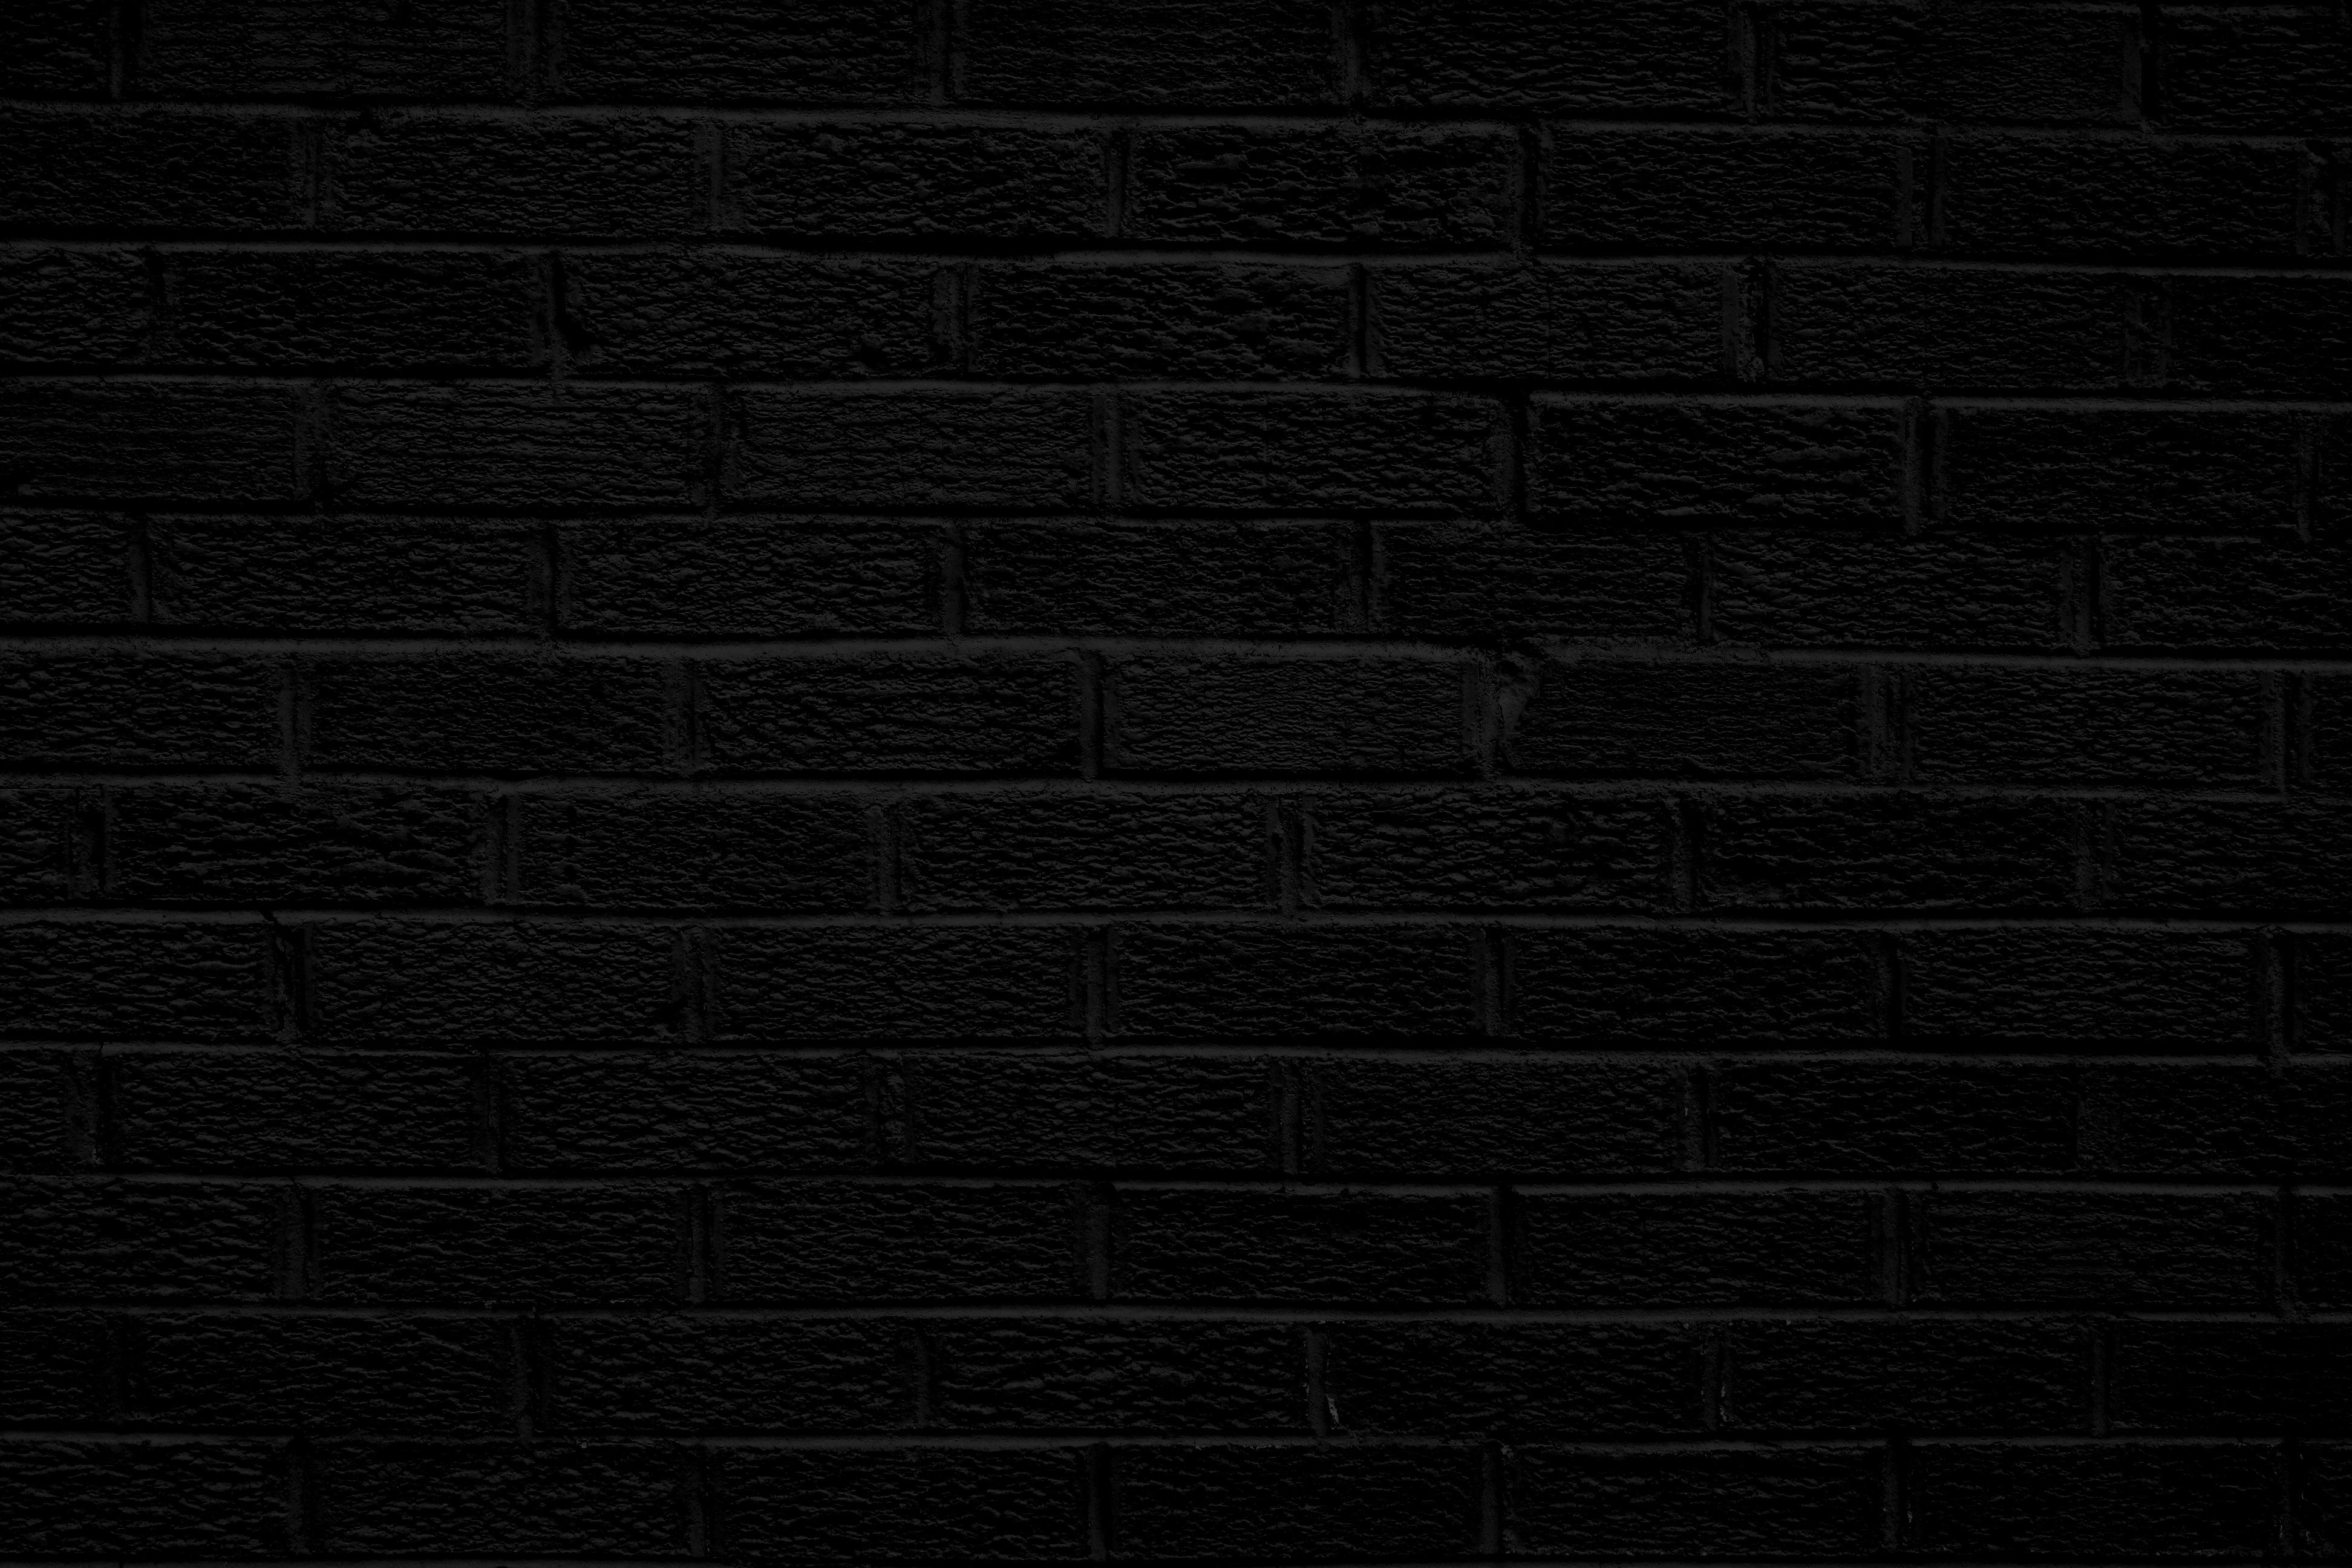 free black  - photo #11